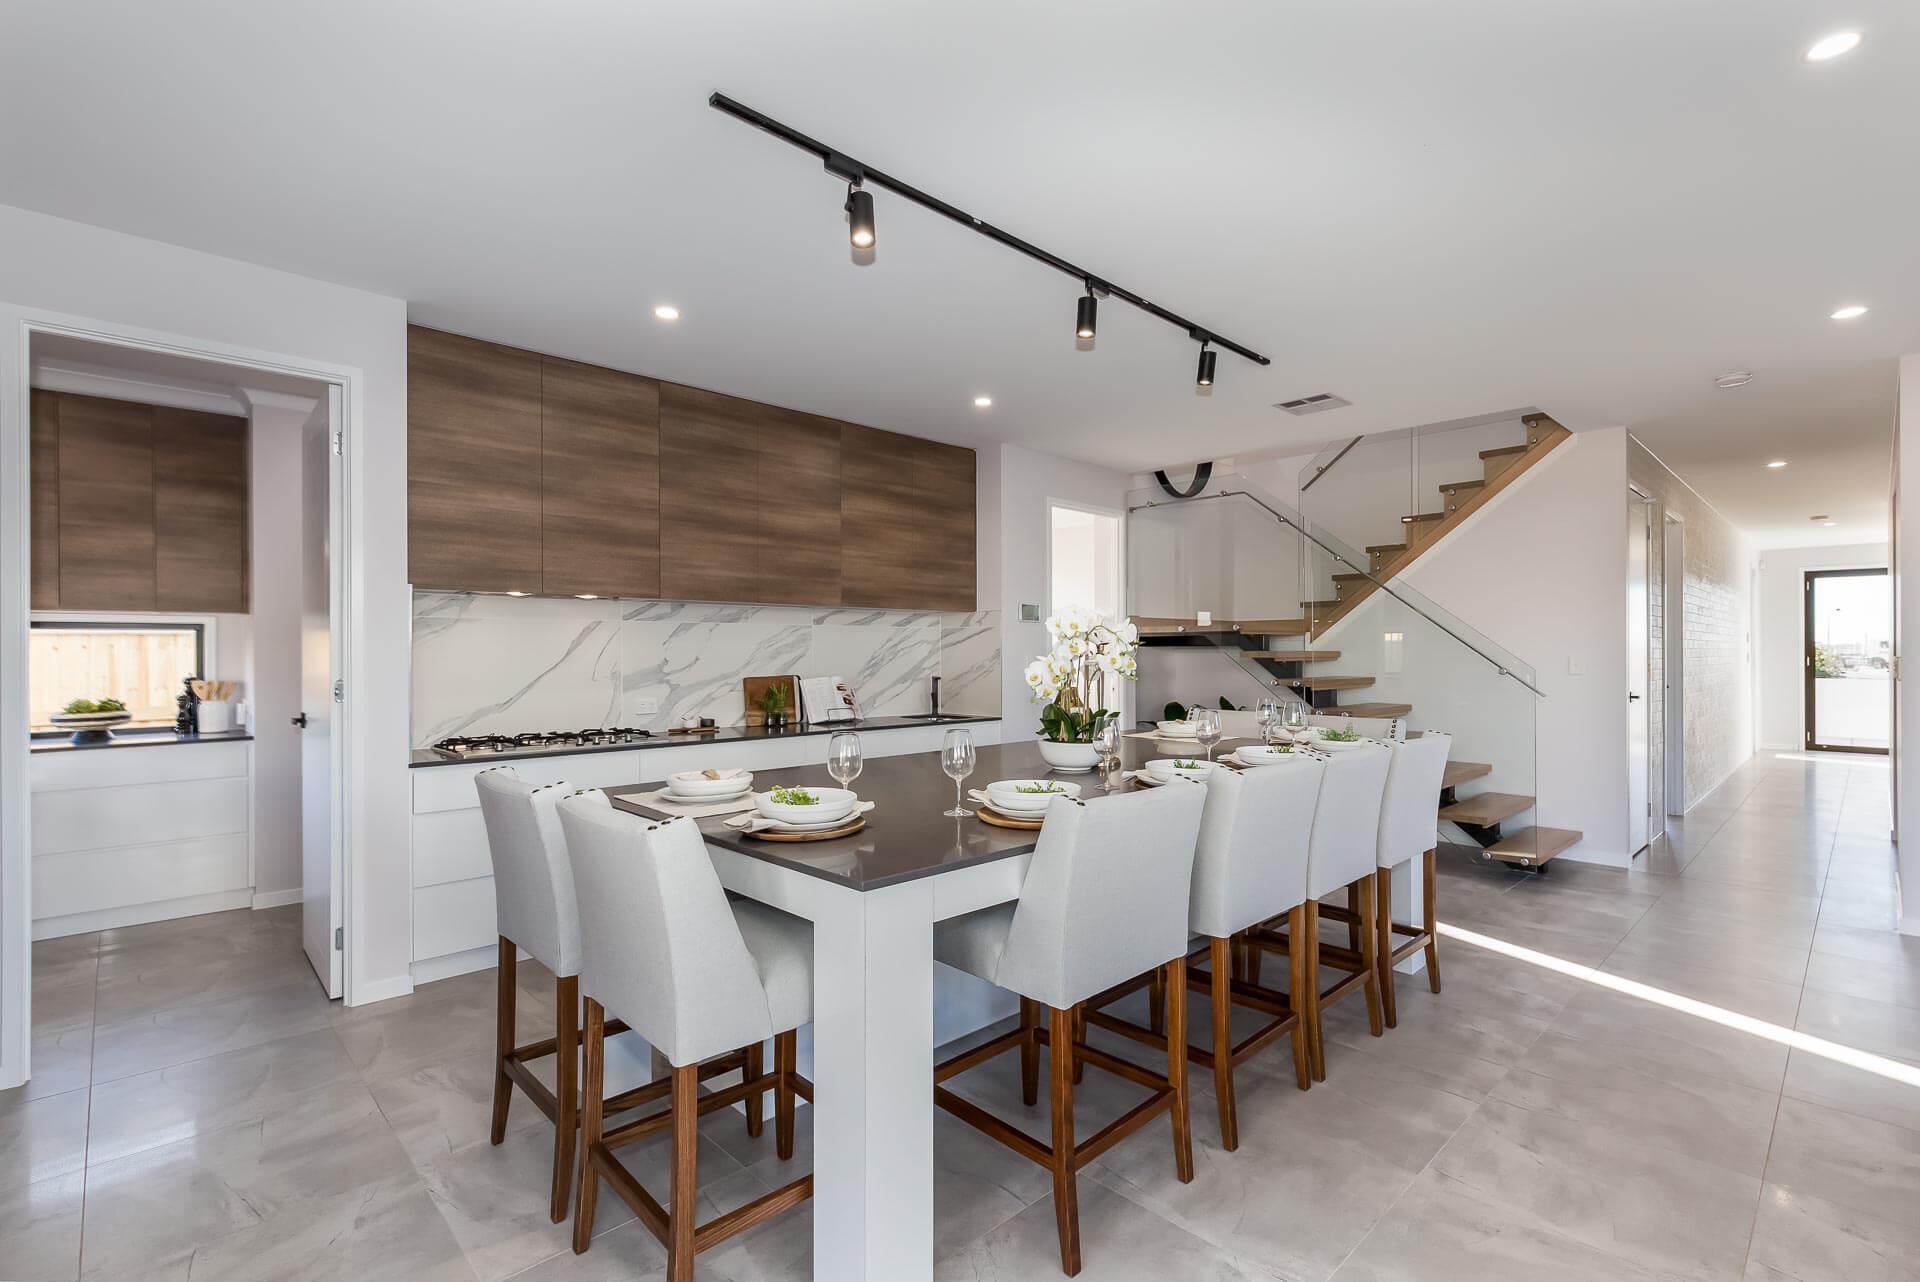 Pantha Kitchen Caloundra marble splashback